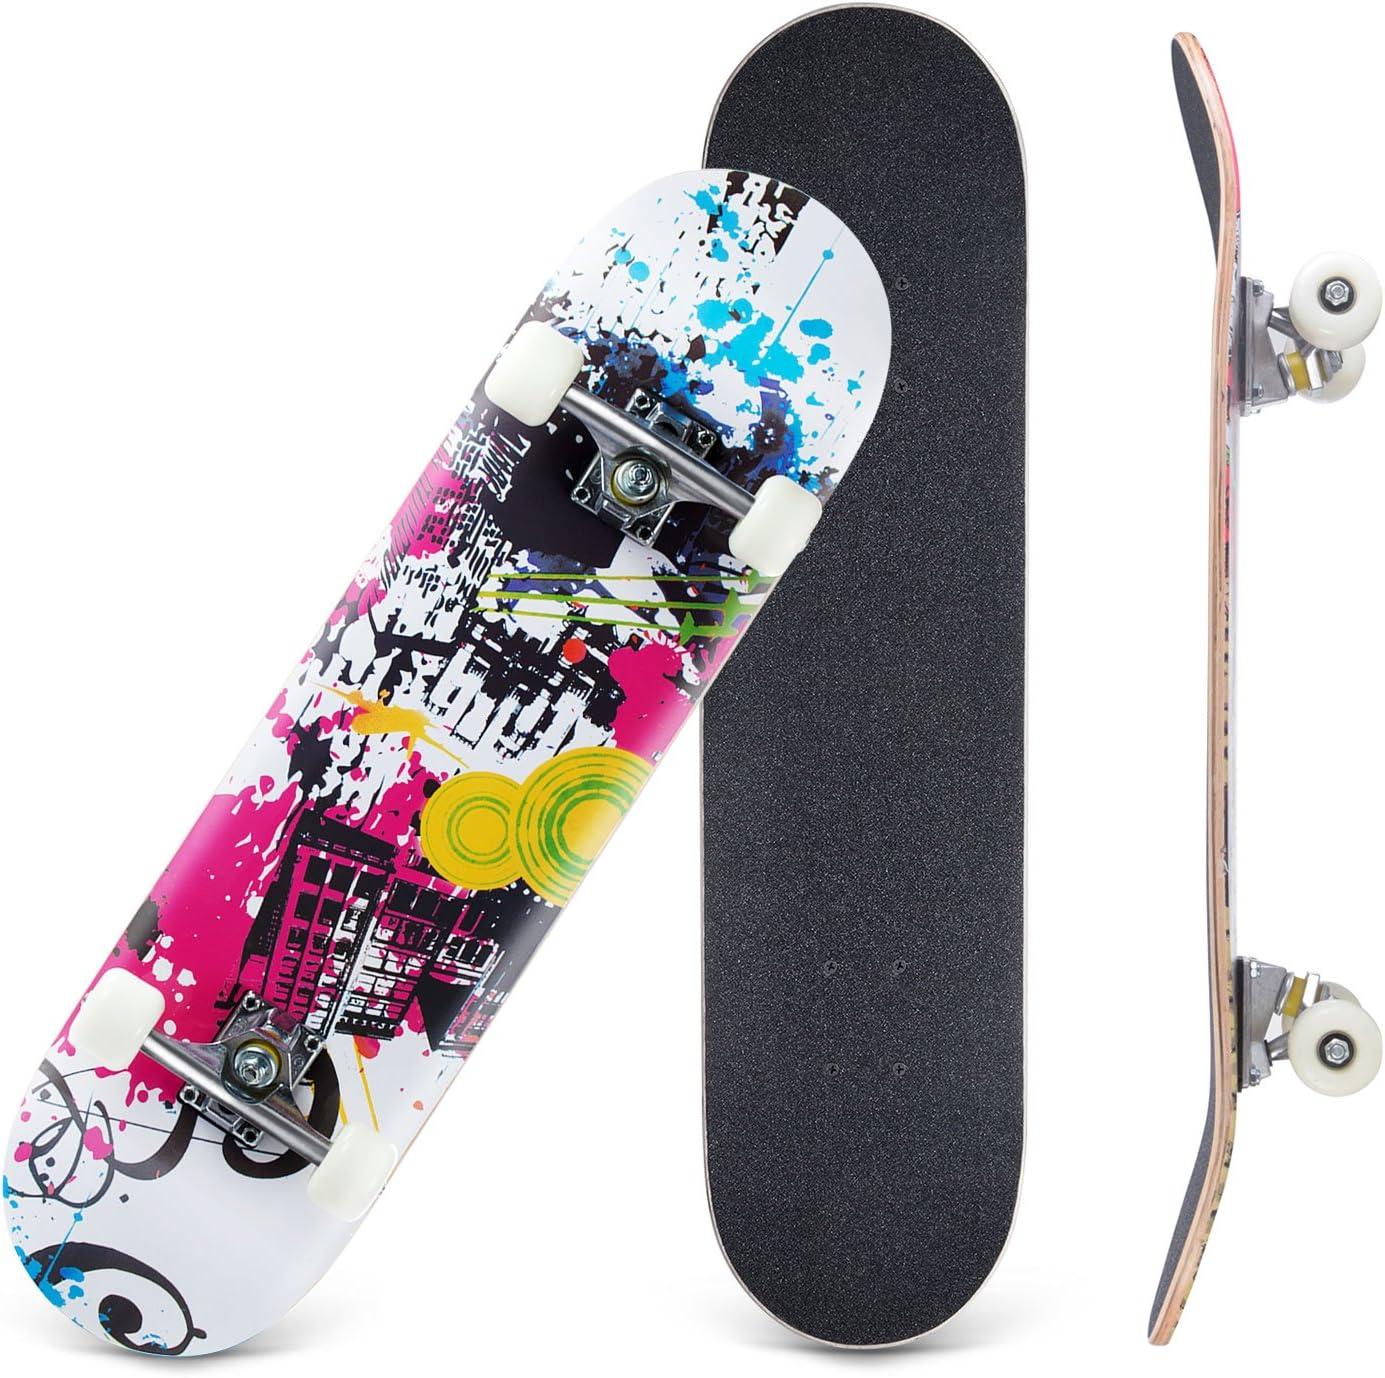 Karriw Skateboard 31 Inch Complete Standard Skateboard 8 Layer Maple Skateboard Deck with Sports Outdoors Durable Skate Board for Kids Beginners